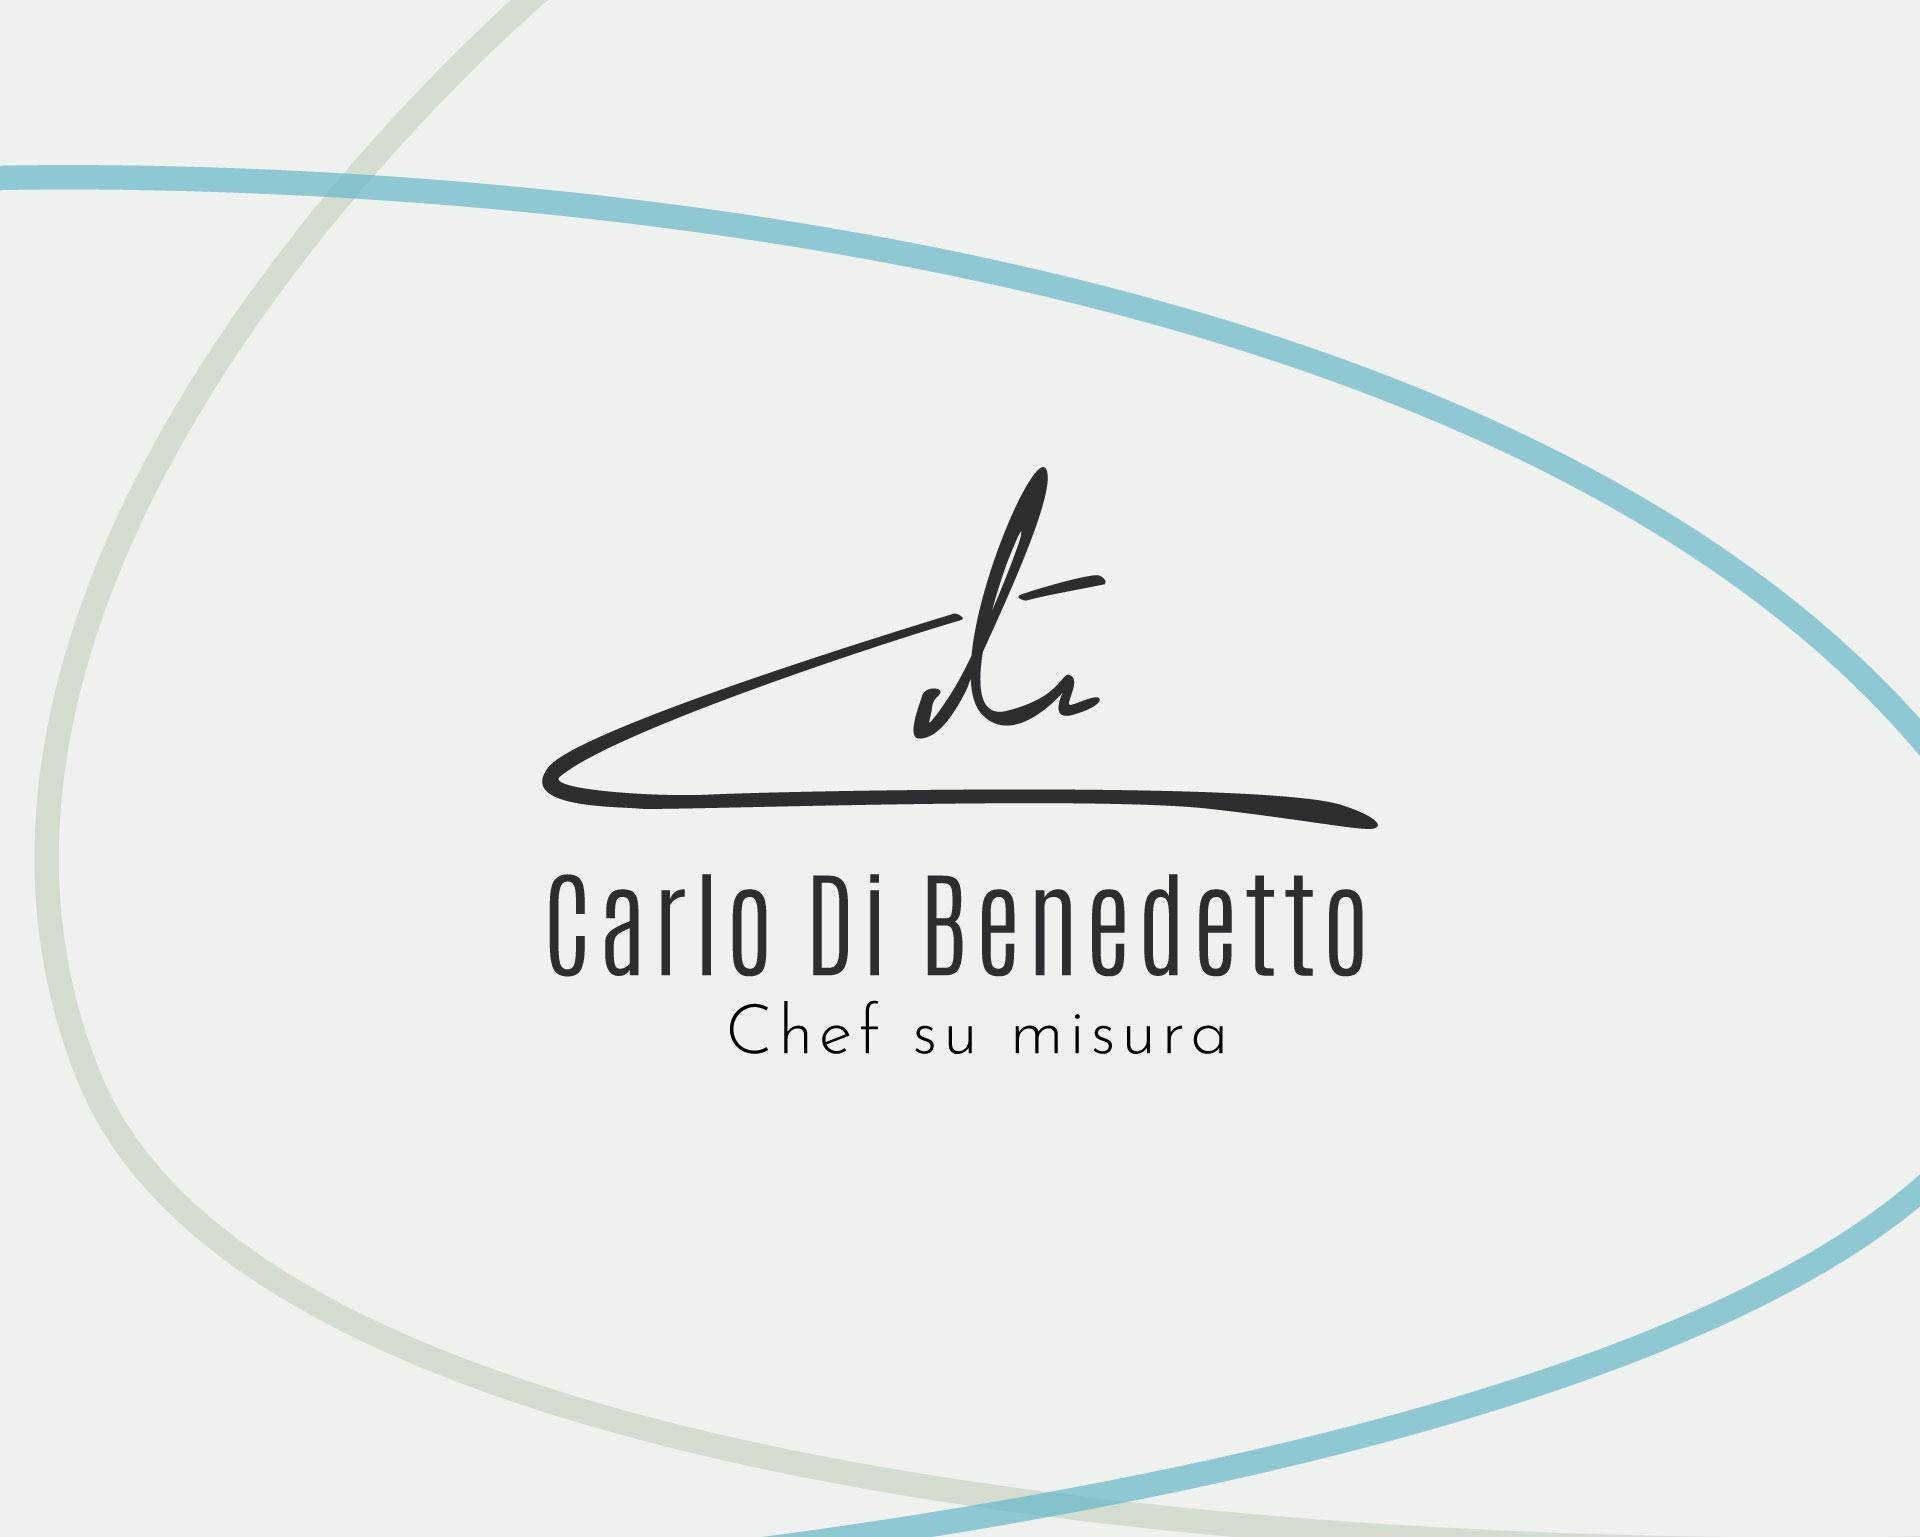 copertina web carlo dibenedetto chef branding logo moodmama portfolio